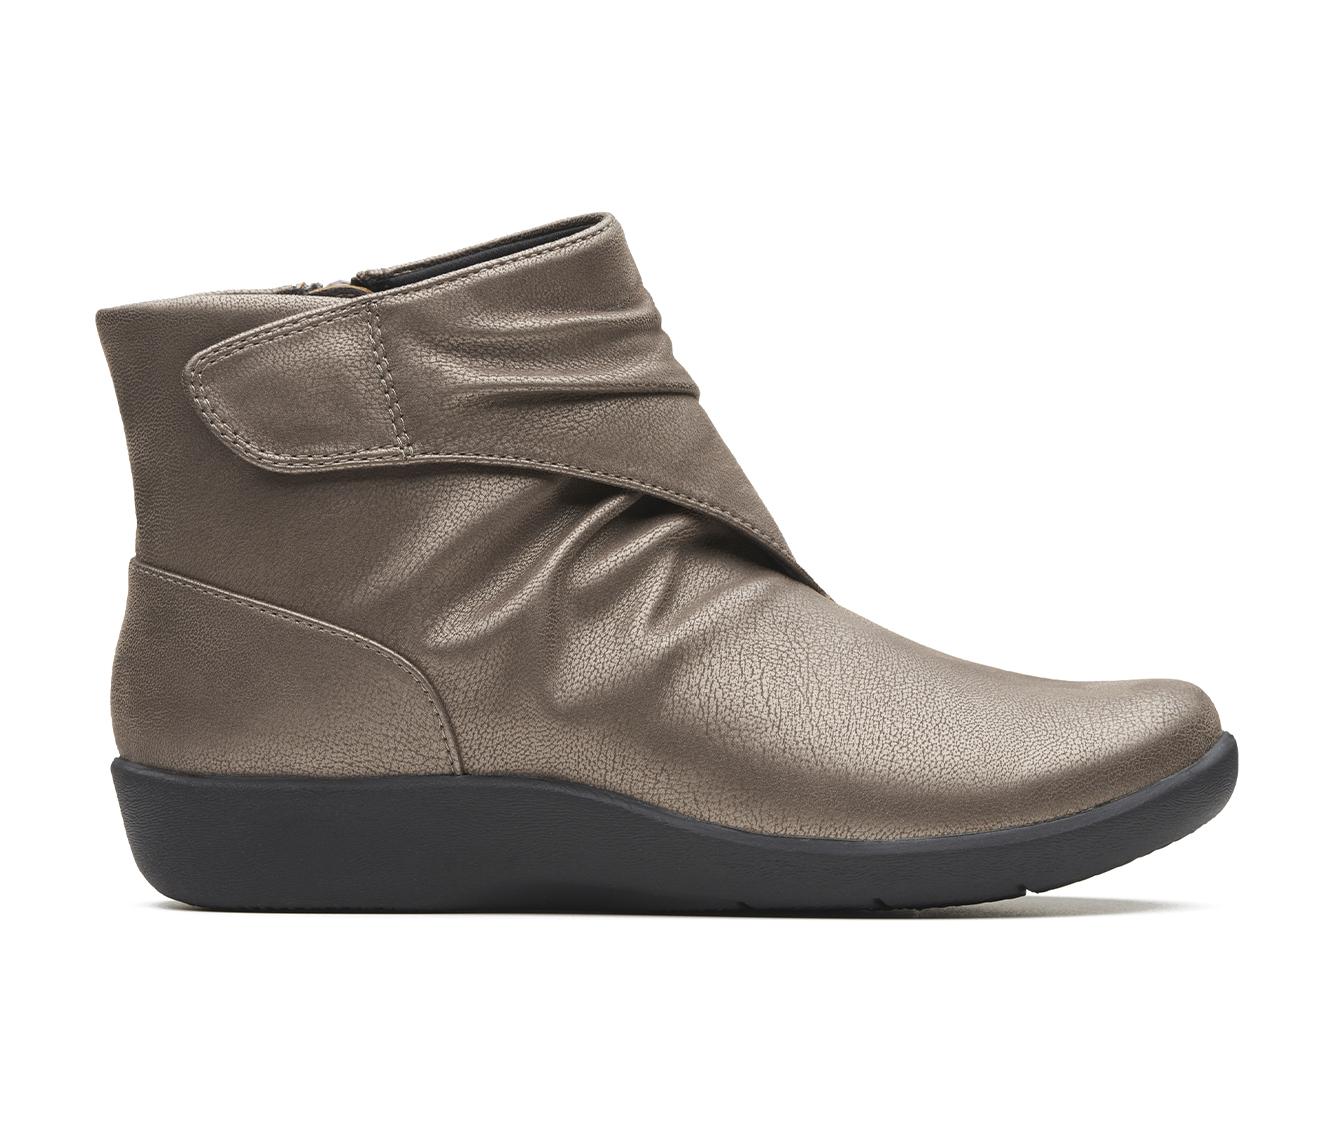 Clarks Sillian Tana Women's Boot (Silver Canvas)